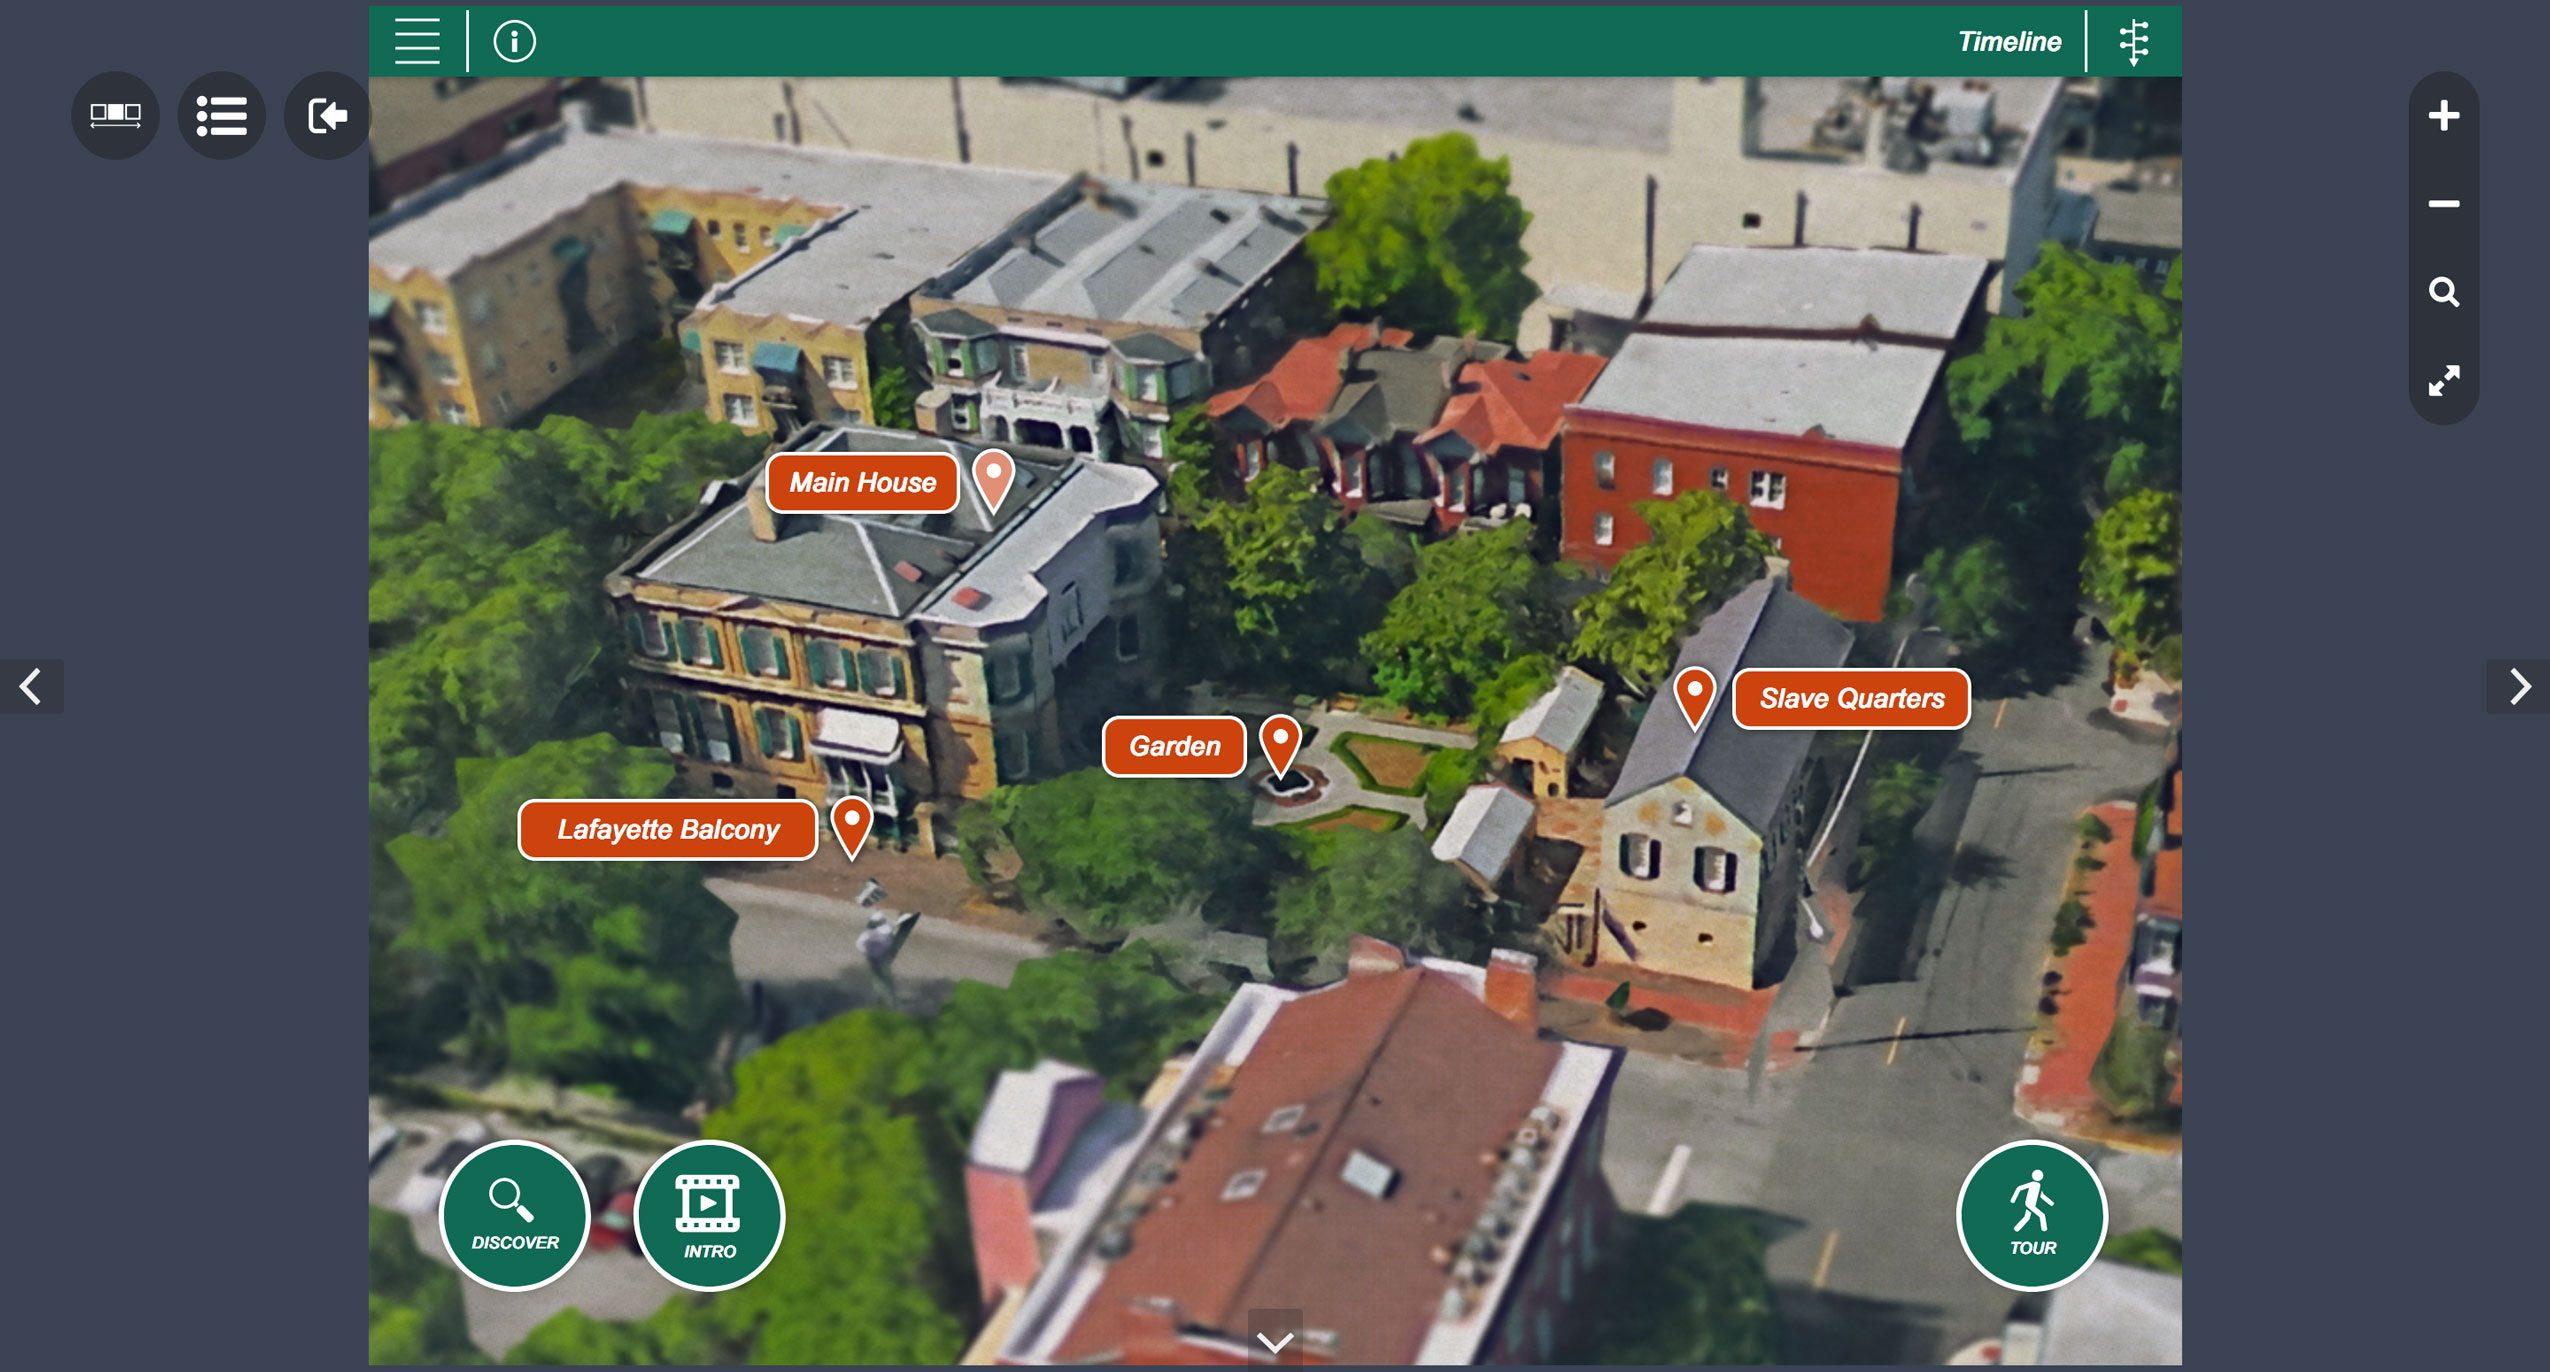 owens-thomas house and slave quarters virtual tour